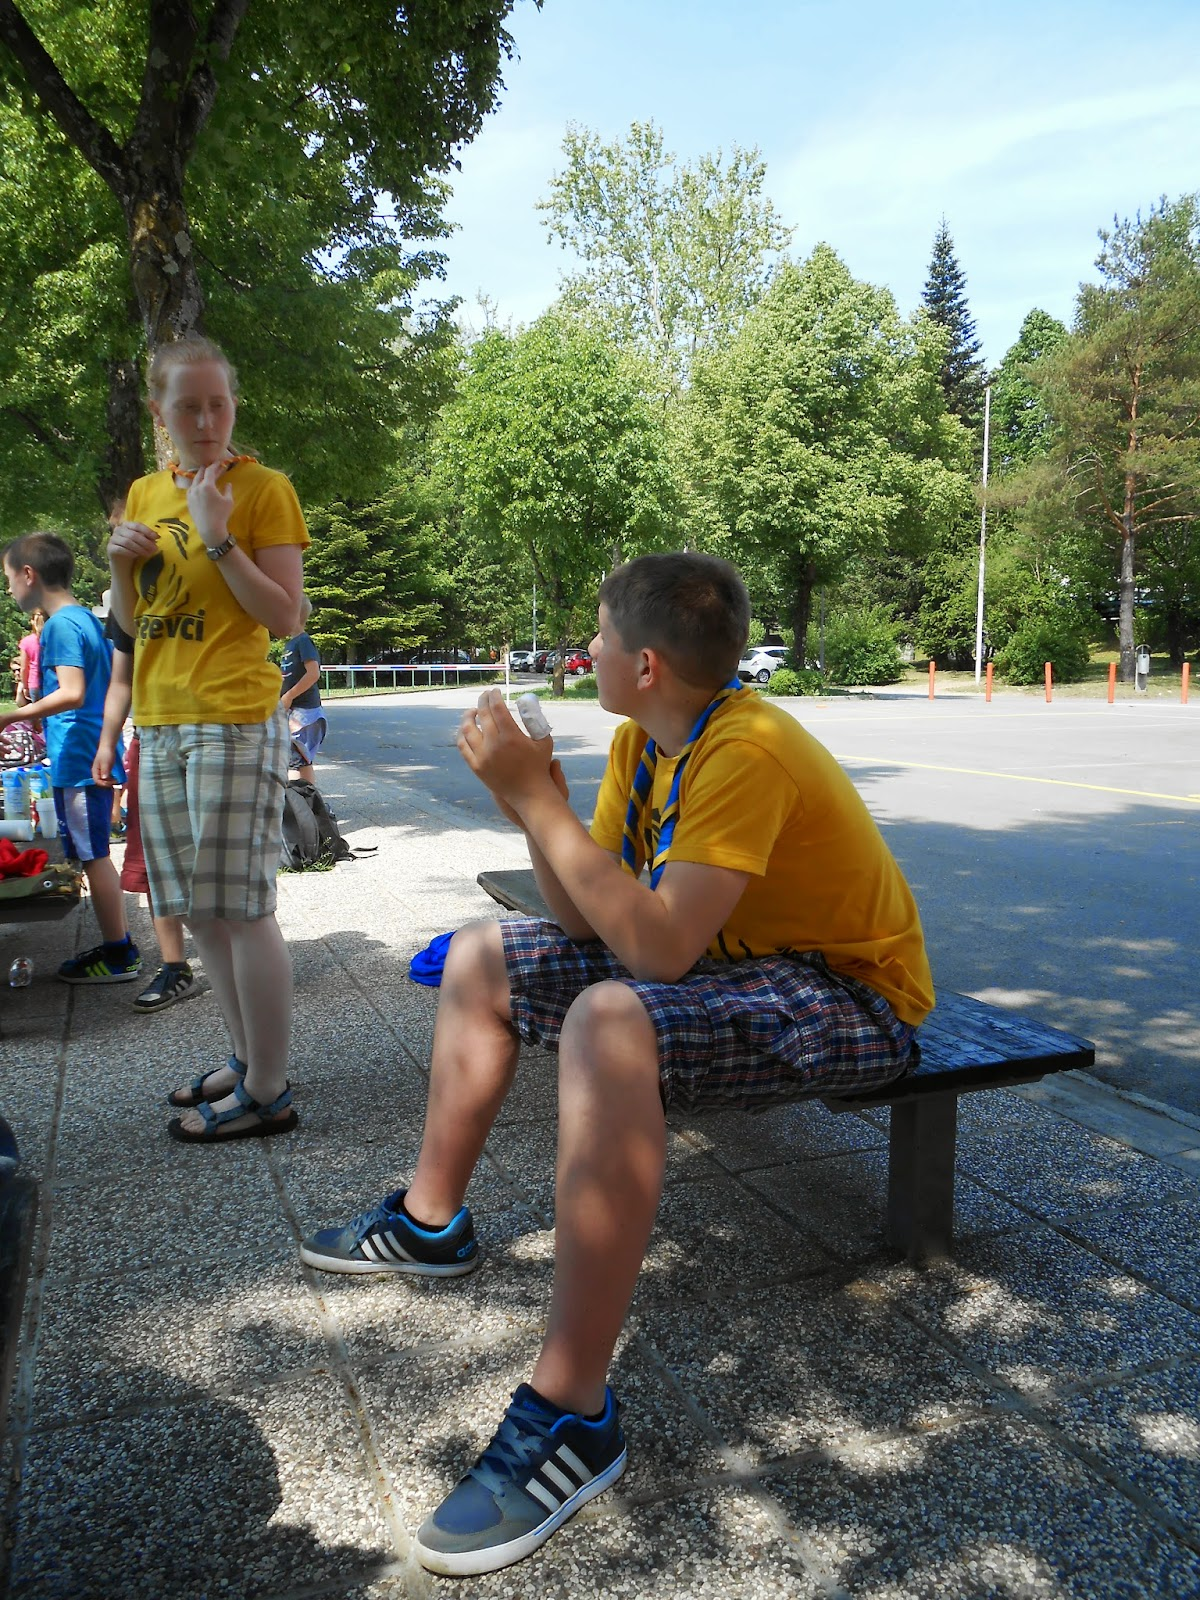 Športni dan 4. a in 4. b, Ilirska Bistrica, 19. 5. 2015 - DSCN4649.JPG